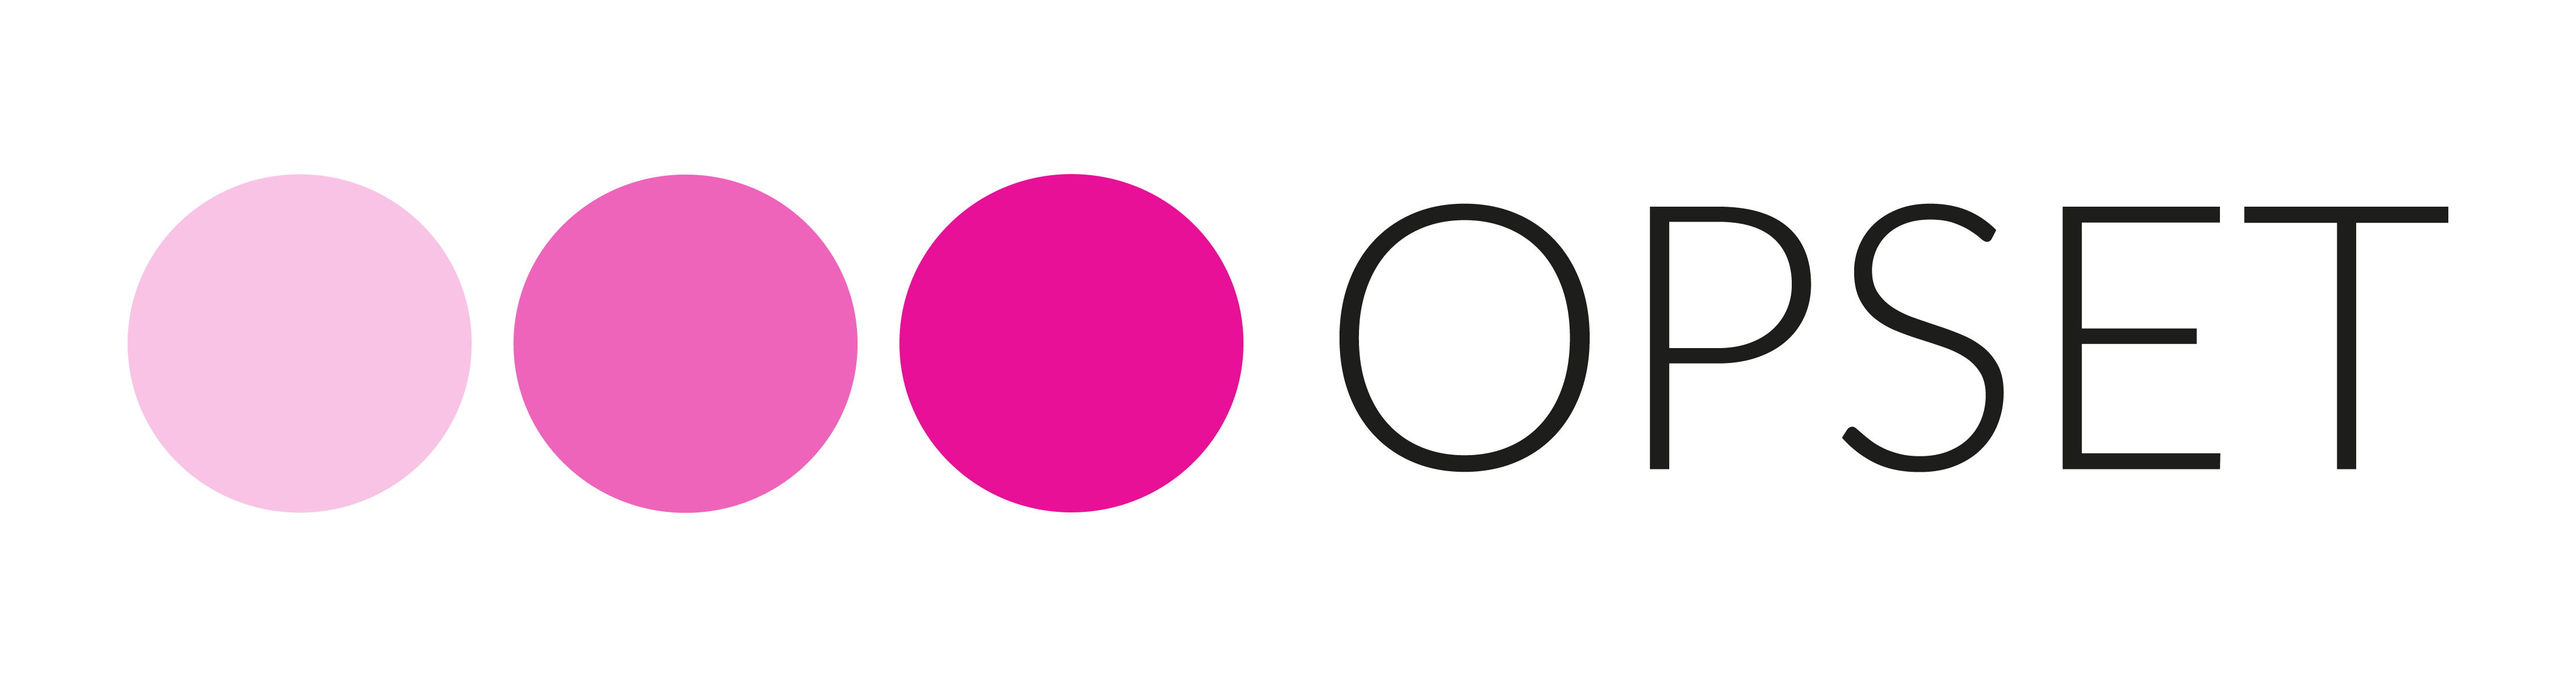 Opset Oy logo